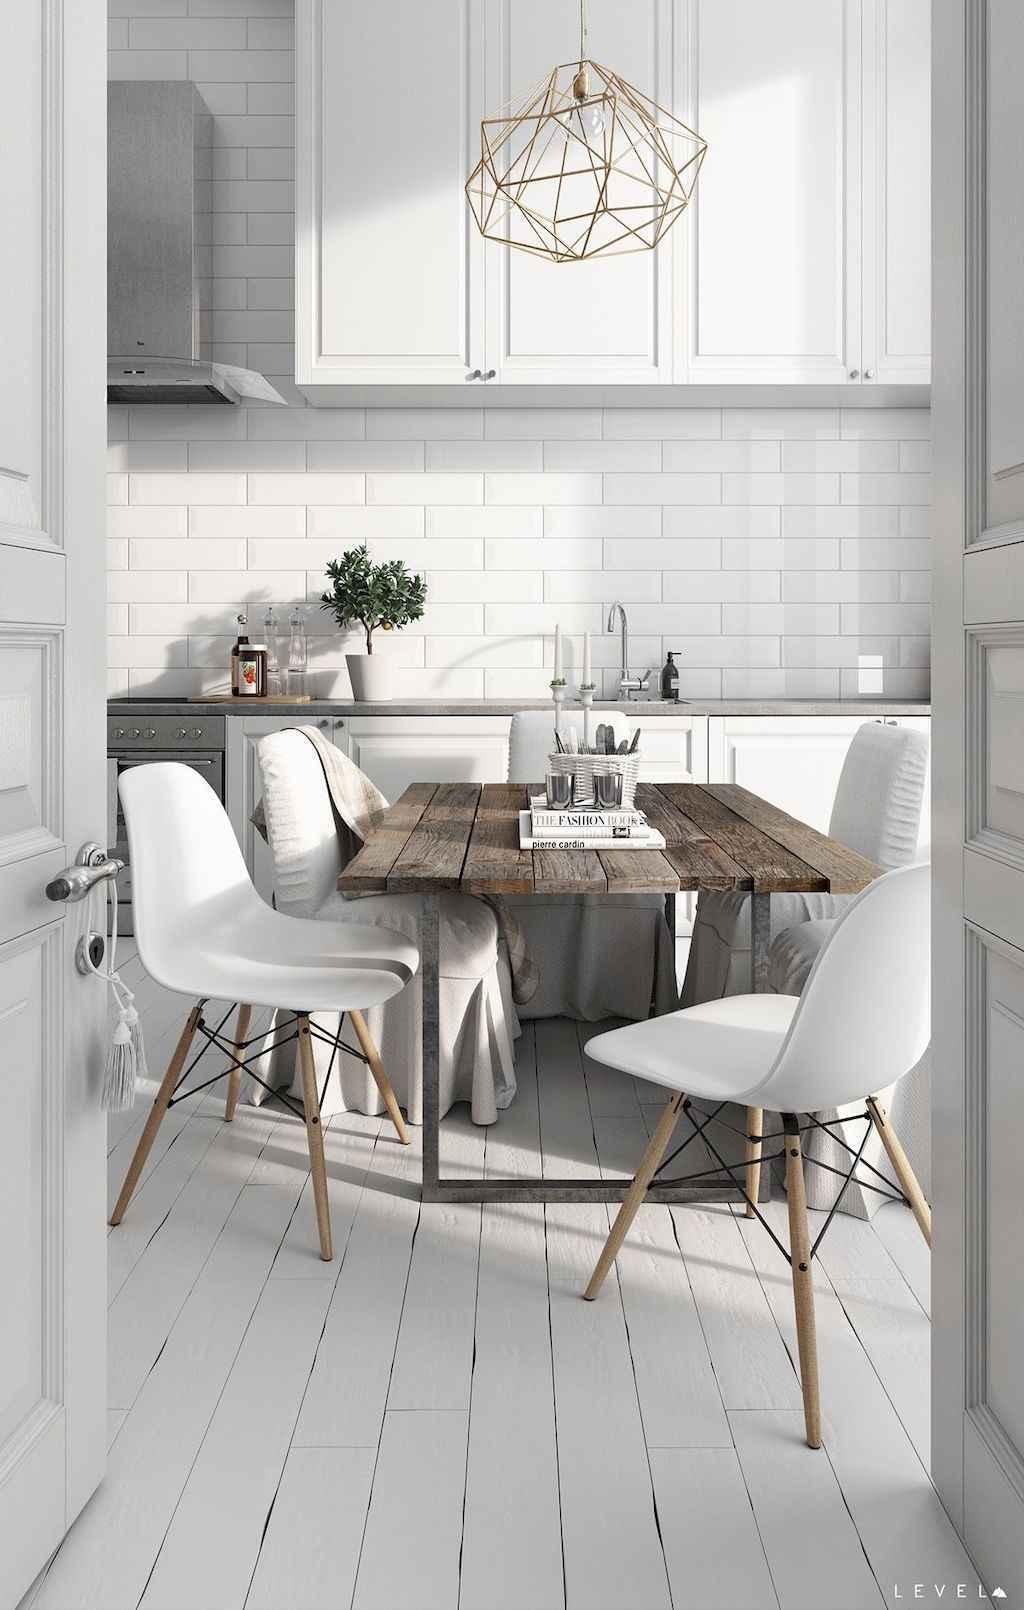 70 Cool Modern Apartment Kitchen Decor Ideas (66)